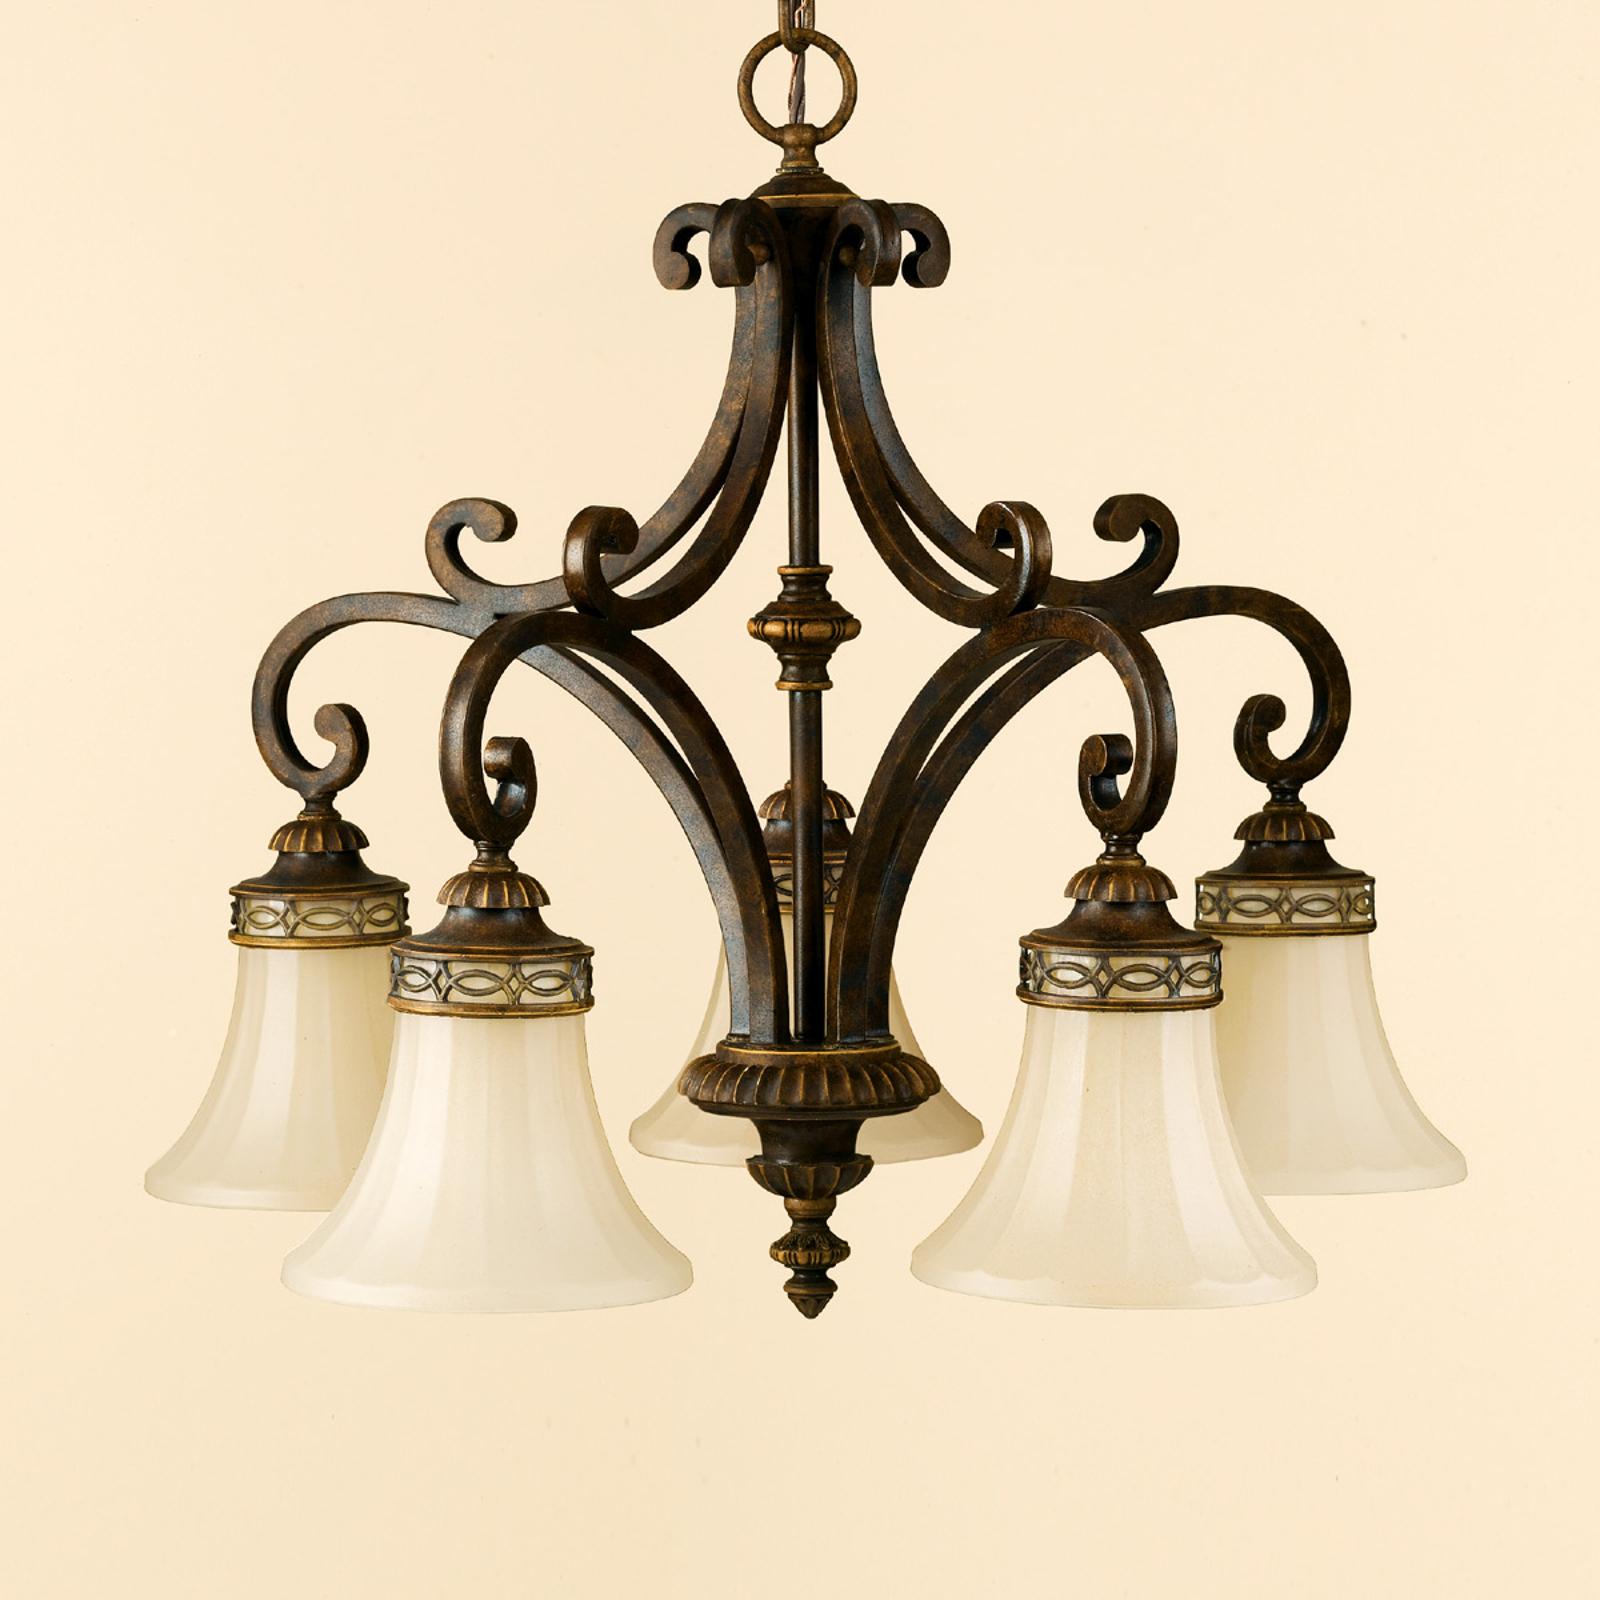 Hanglamp DRAWING ROOM, 5-lichts